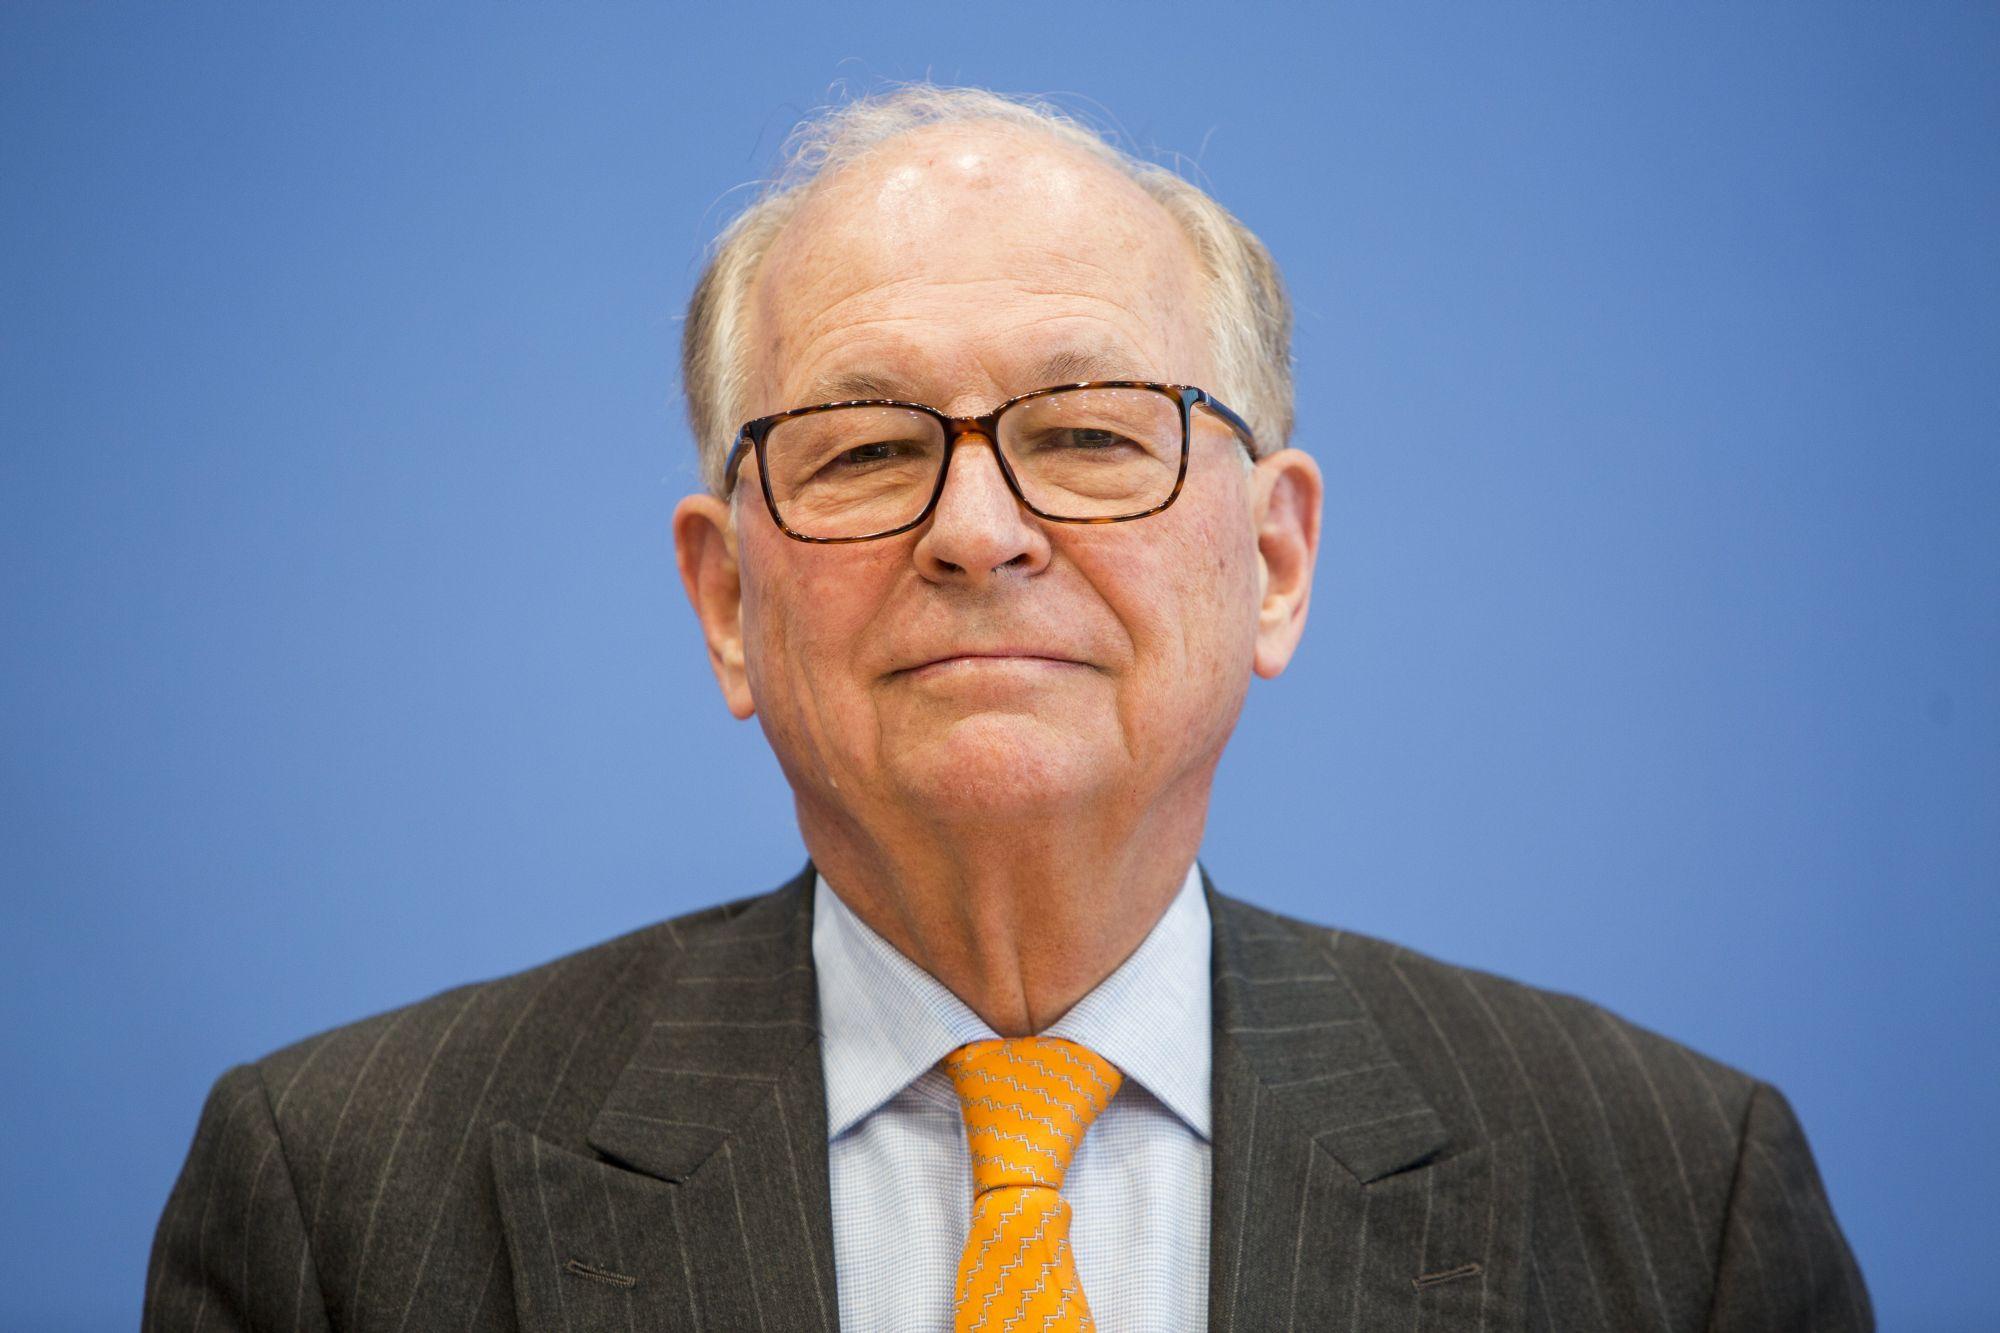 Wolfgang Ischinger, az MSC elnöke Berlinben, 2018. február 8-án. EPA/OMER MESSINGER